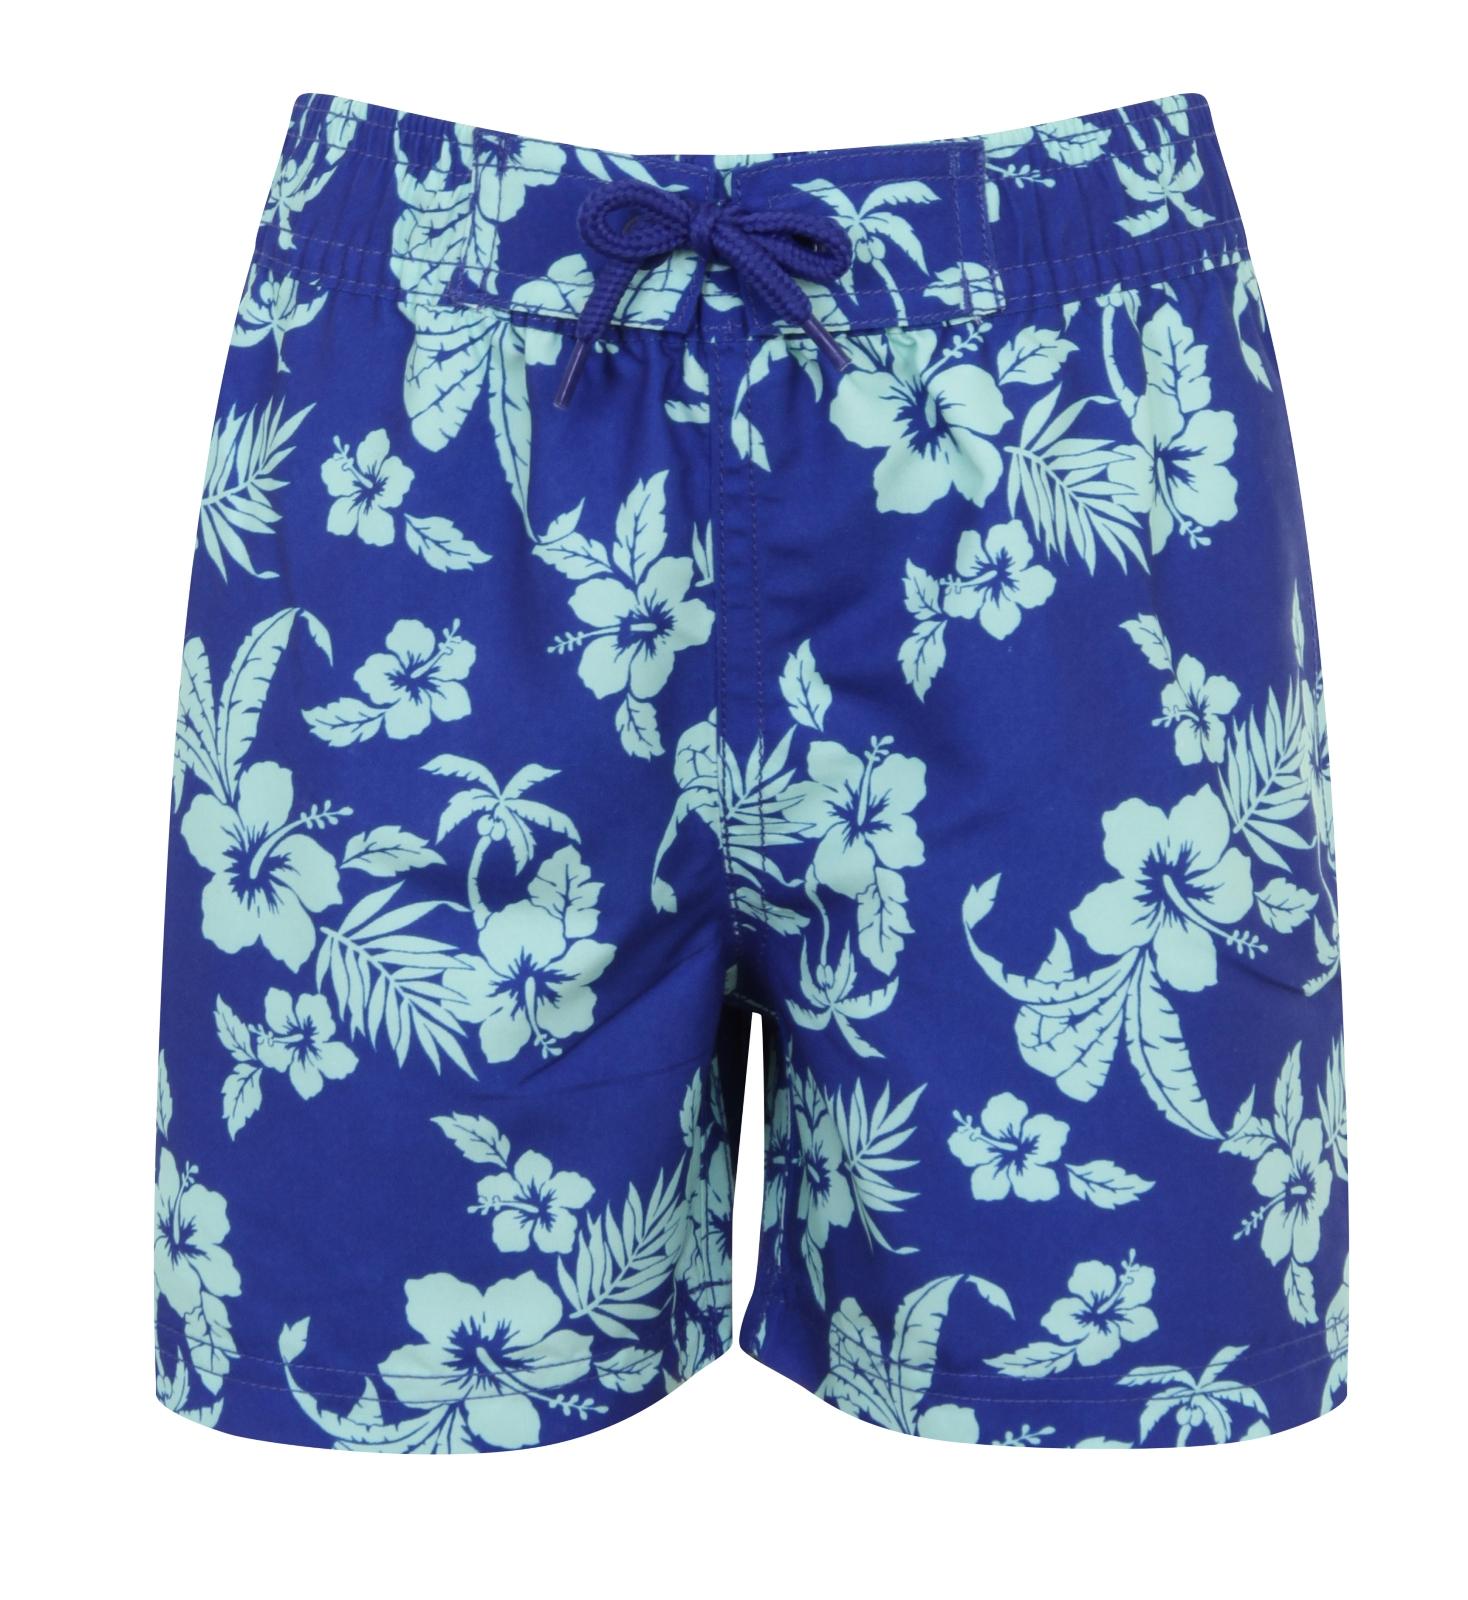 Boys Swim Shorts Swimming Trunks Casual Beach Holiday Board Swimwear ... dee80c28886f